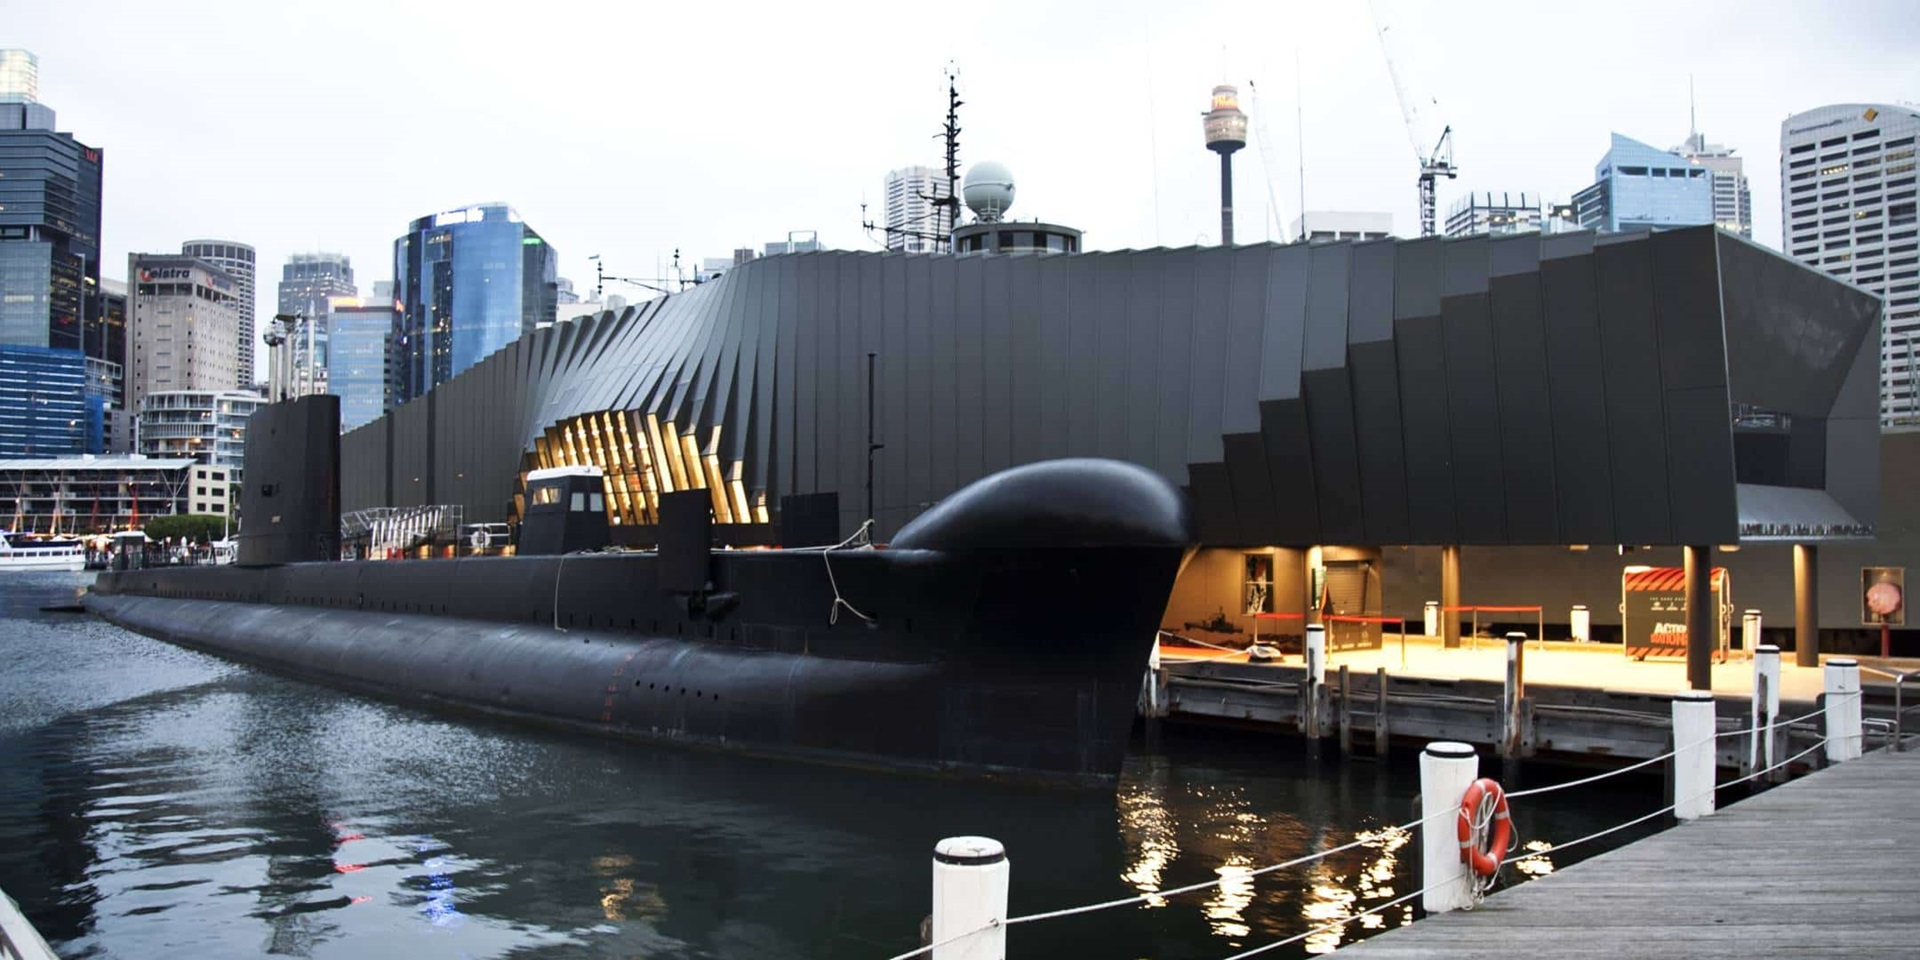 HMAS Onslow - Australian National Maritime Museum